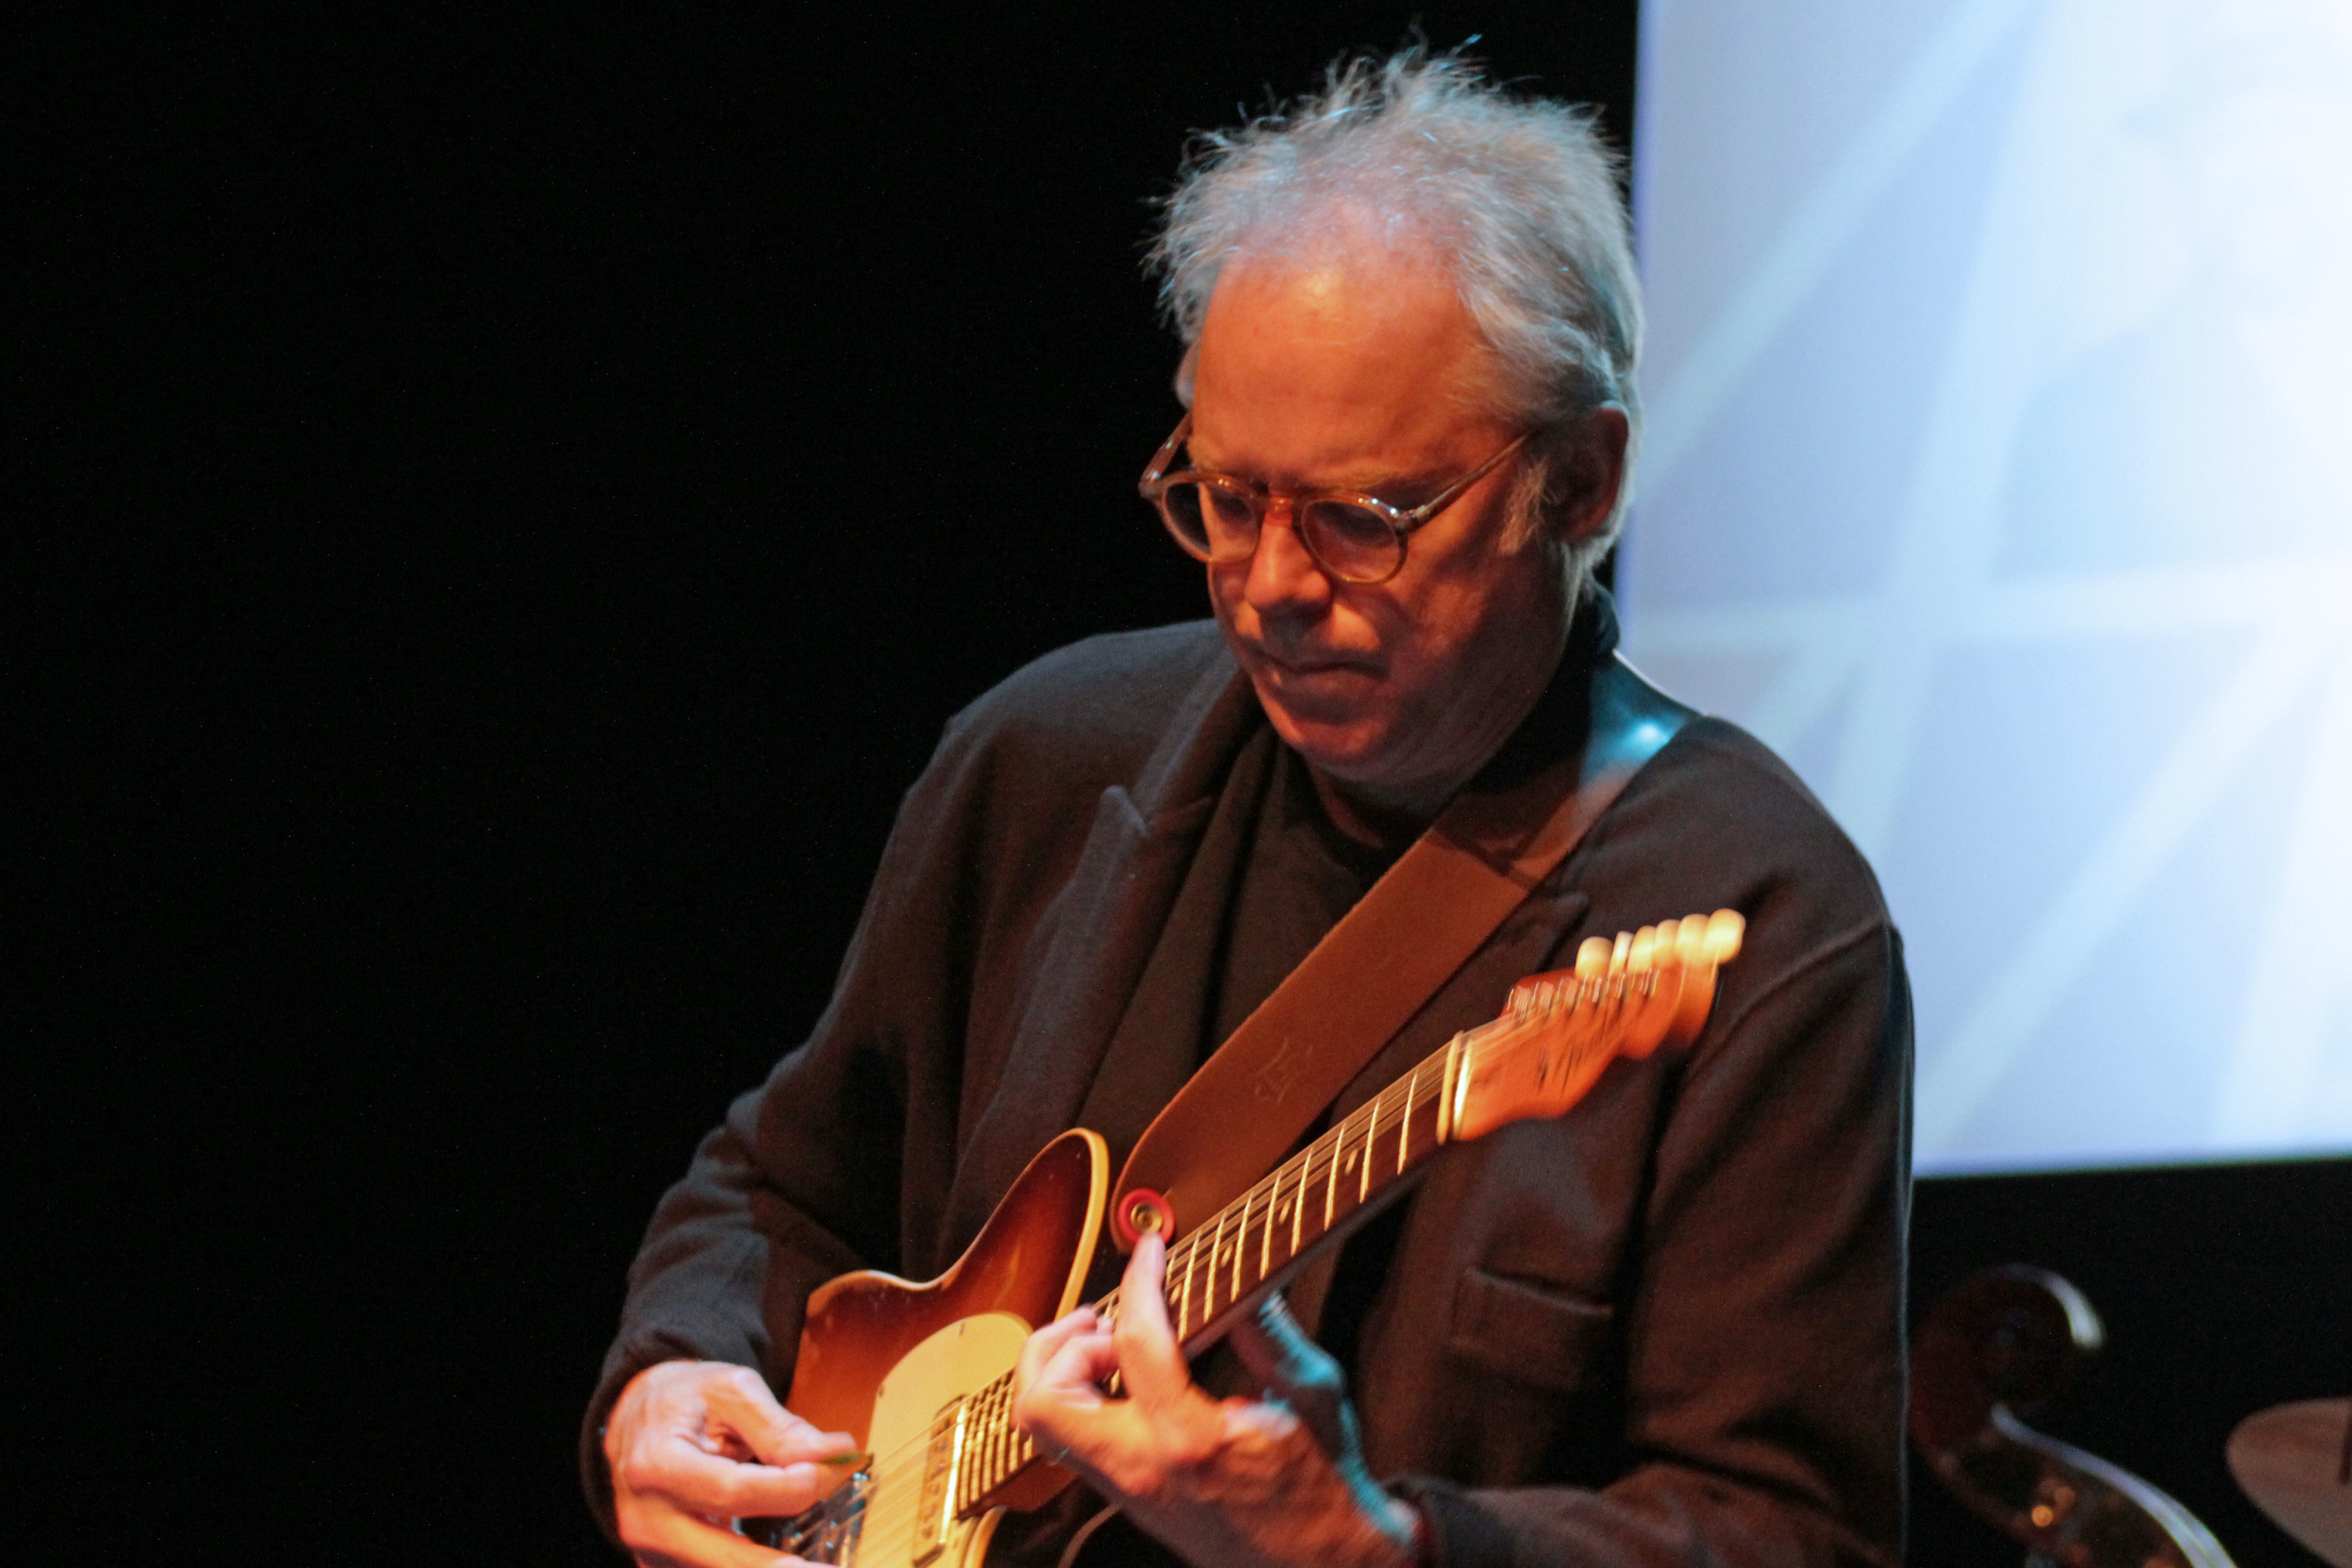 Bill frisell at tri-c jazzfest cleveland 2013